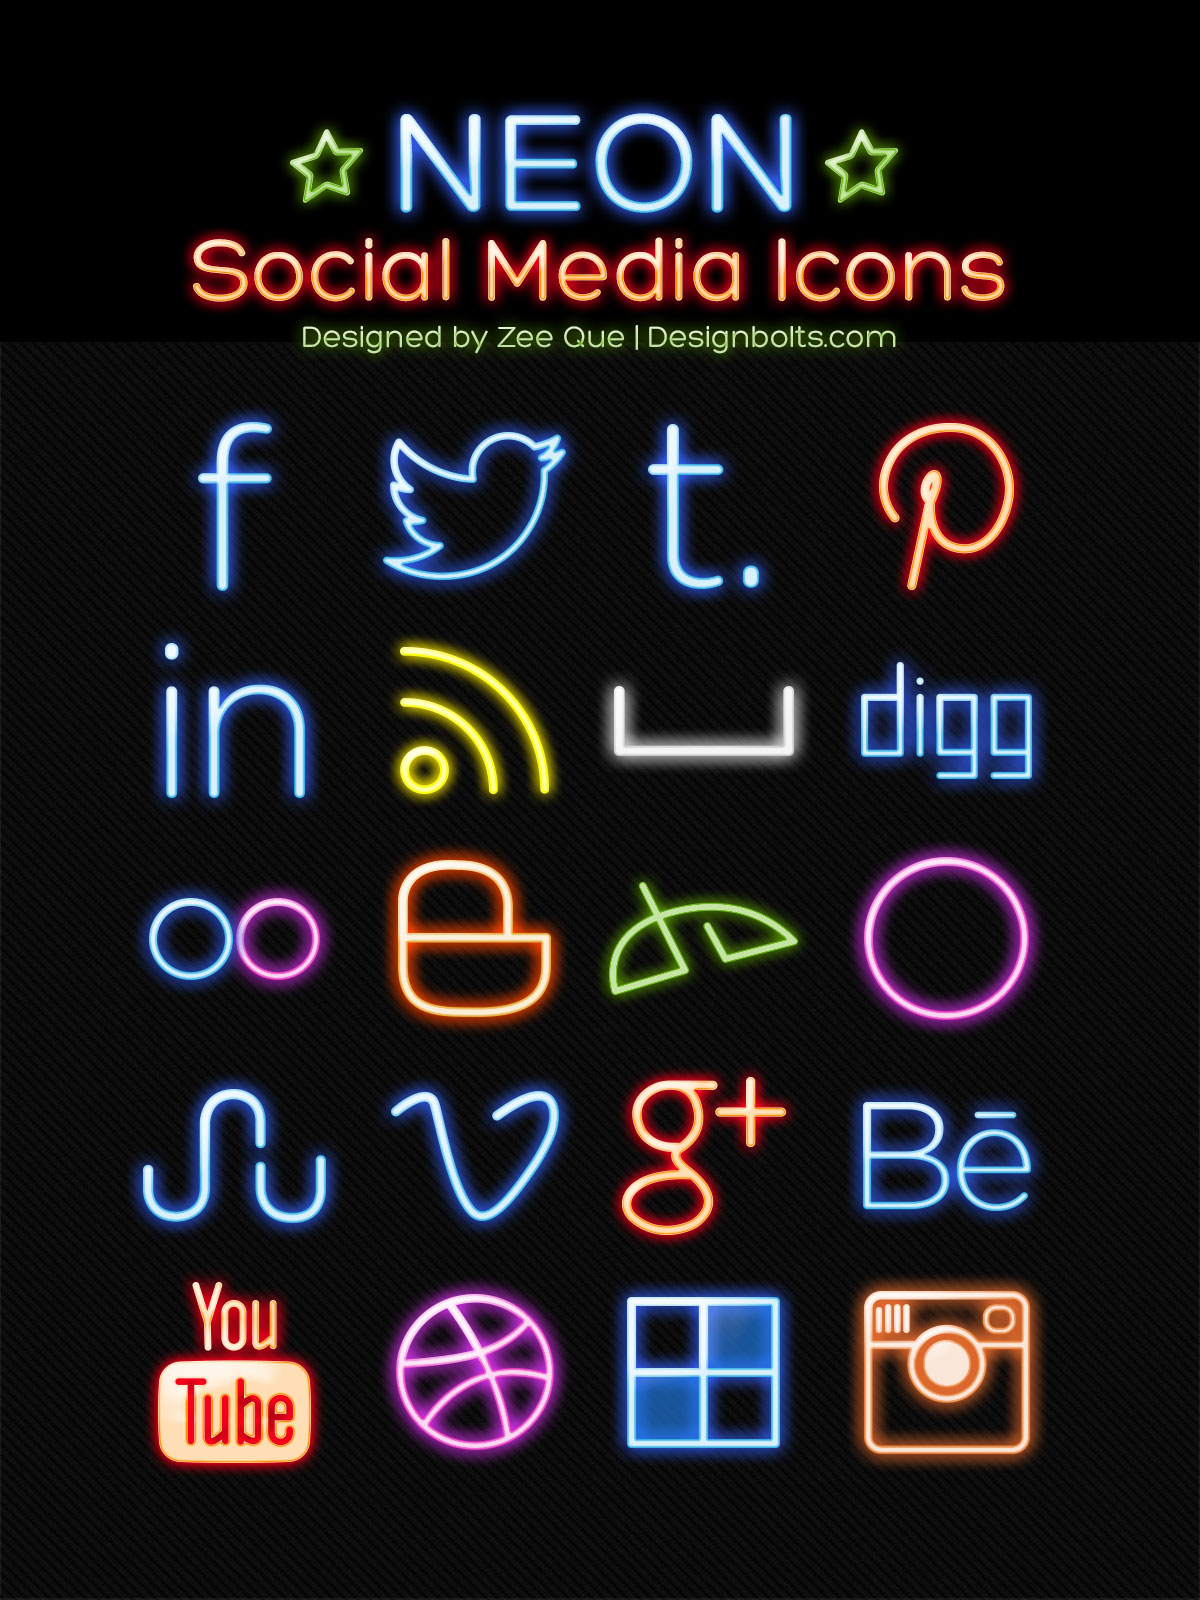 Neon Free Social Media Icons 2014